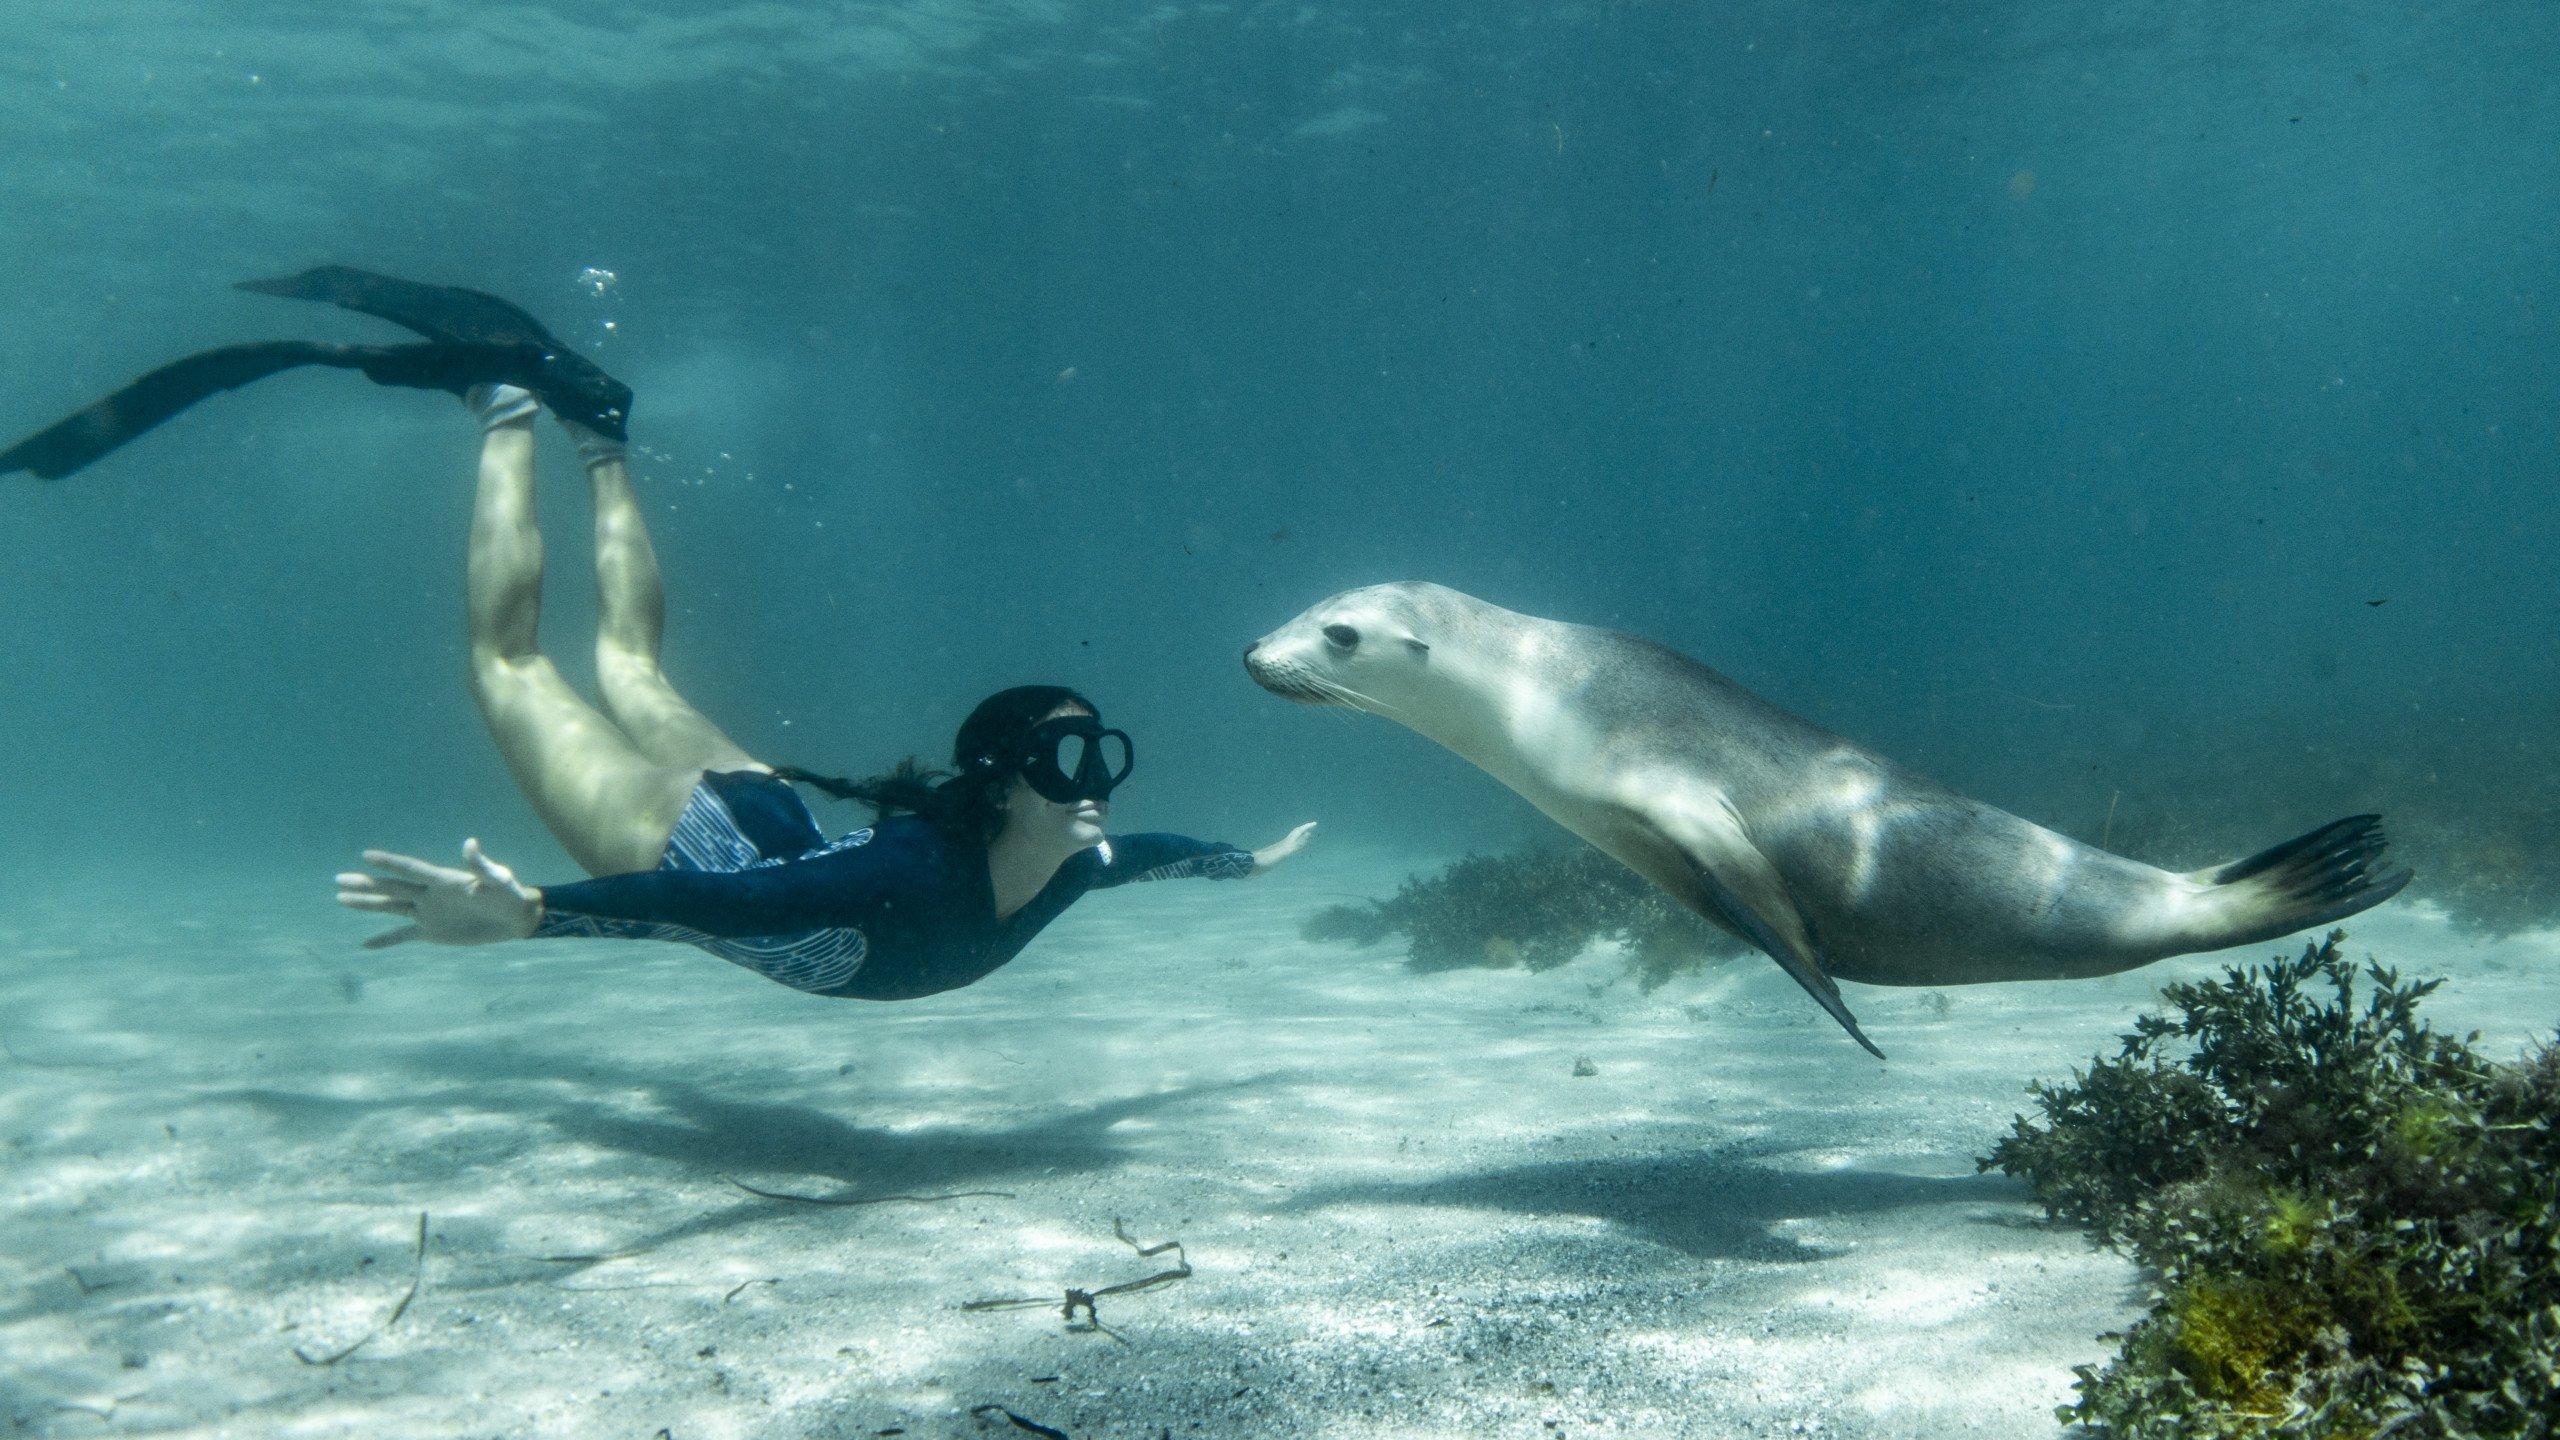 Scuba Diving - Adventure on the TRUE NORTH